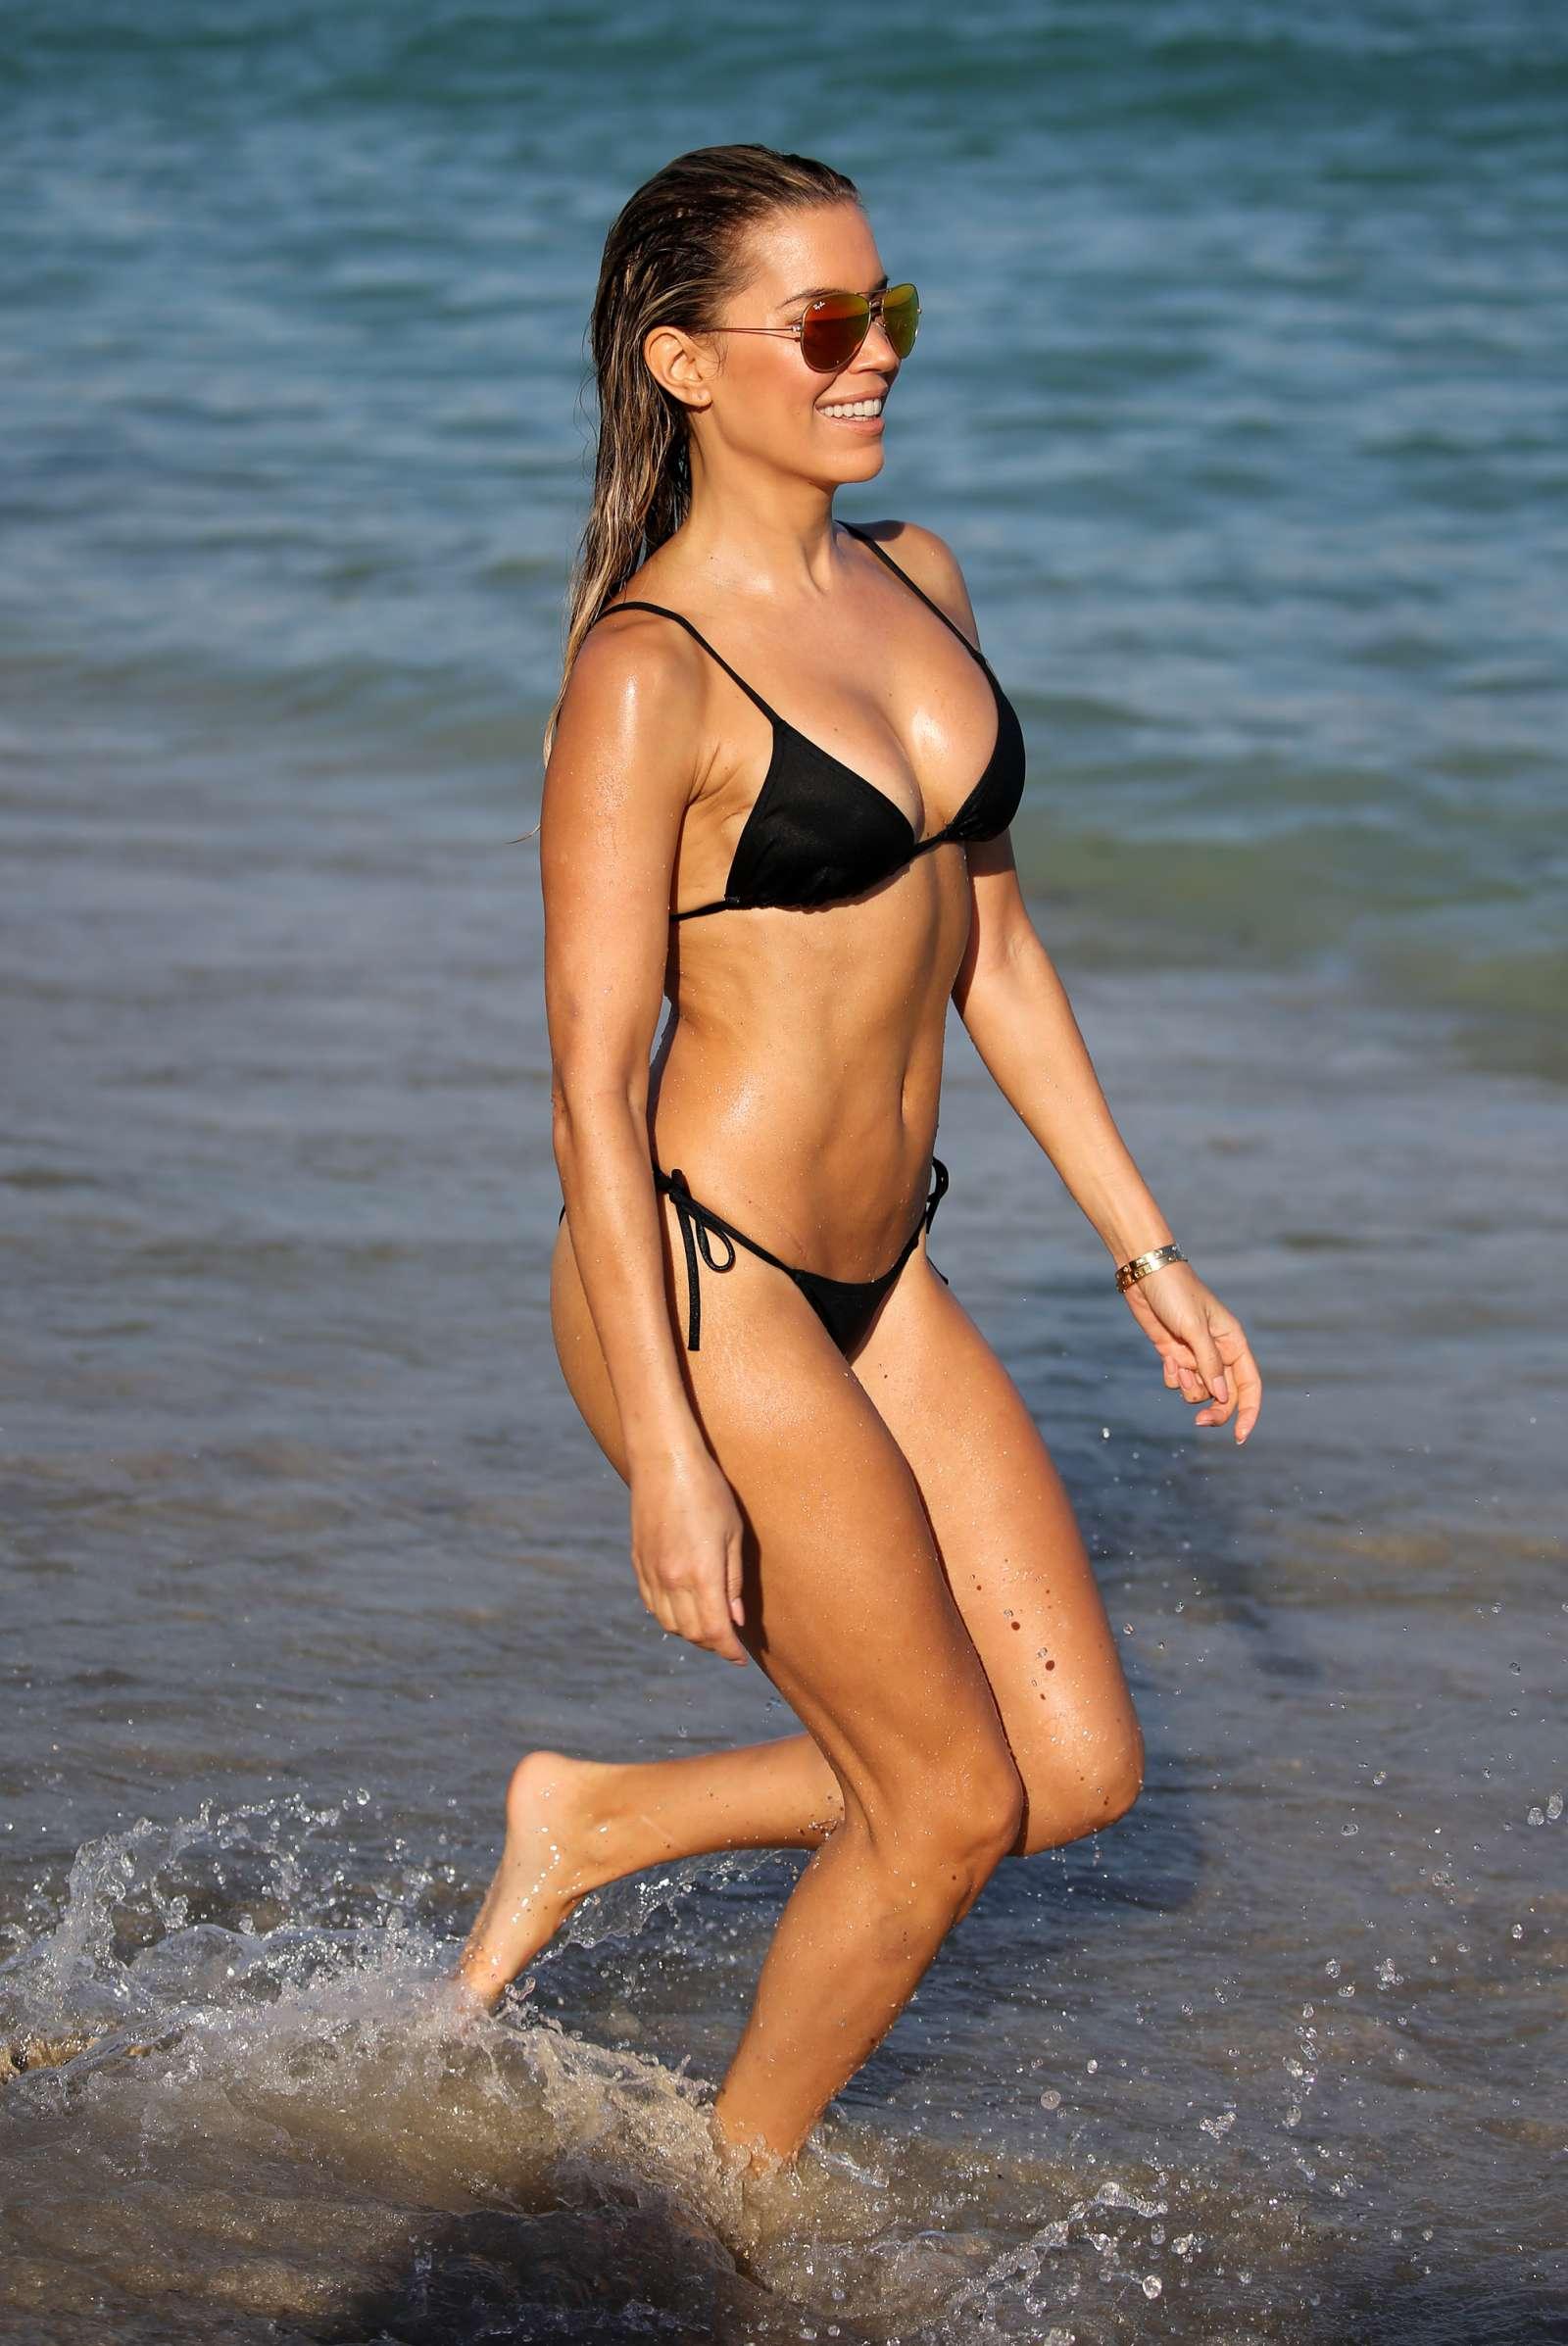 Sylvie Meis 2017 : Sylvie Meis in Black Bikini 2017 -15